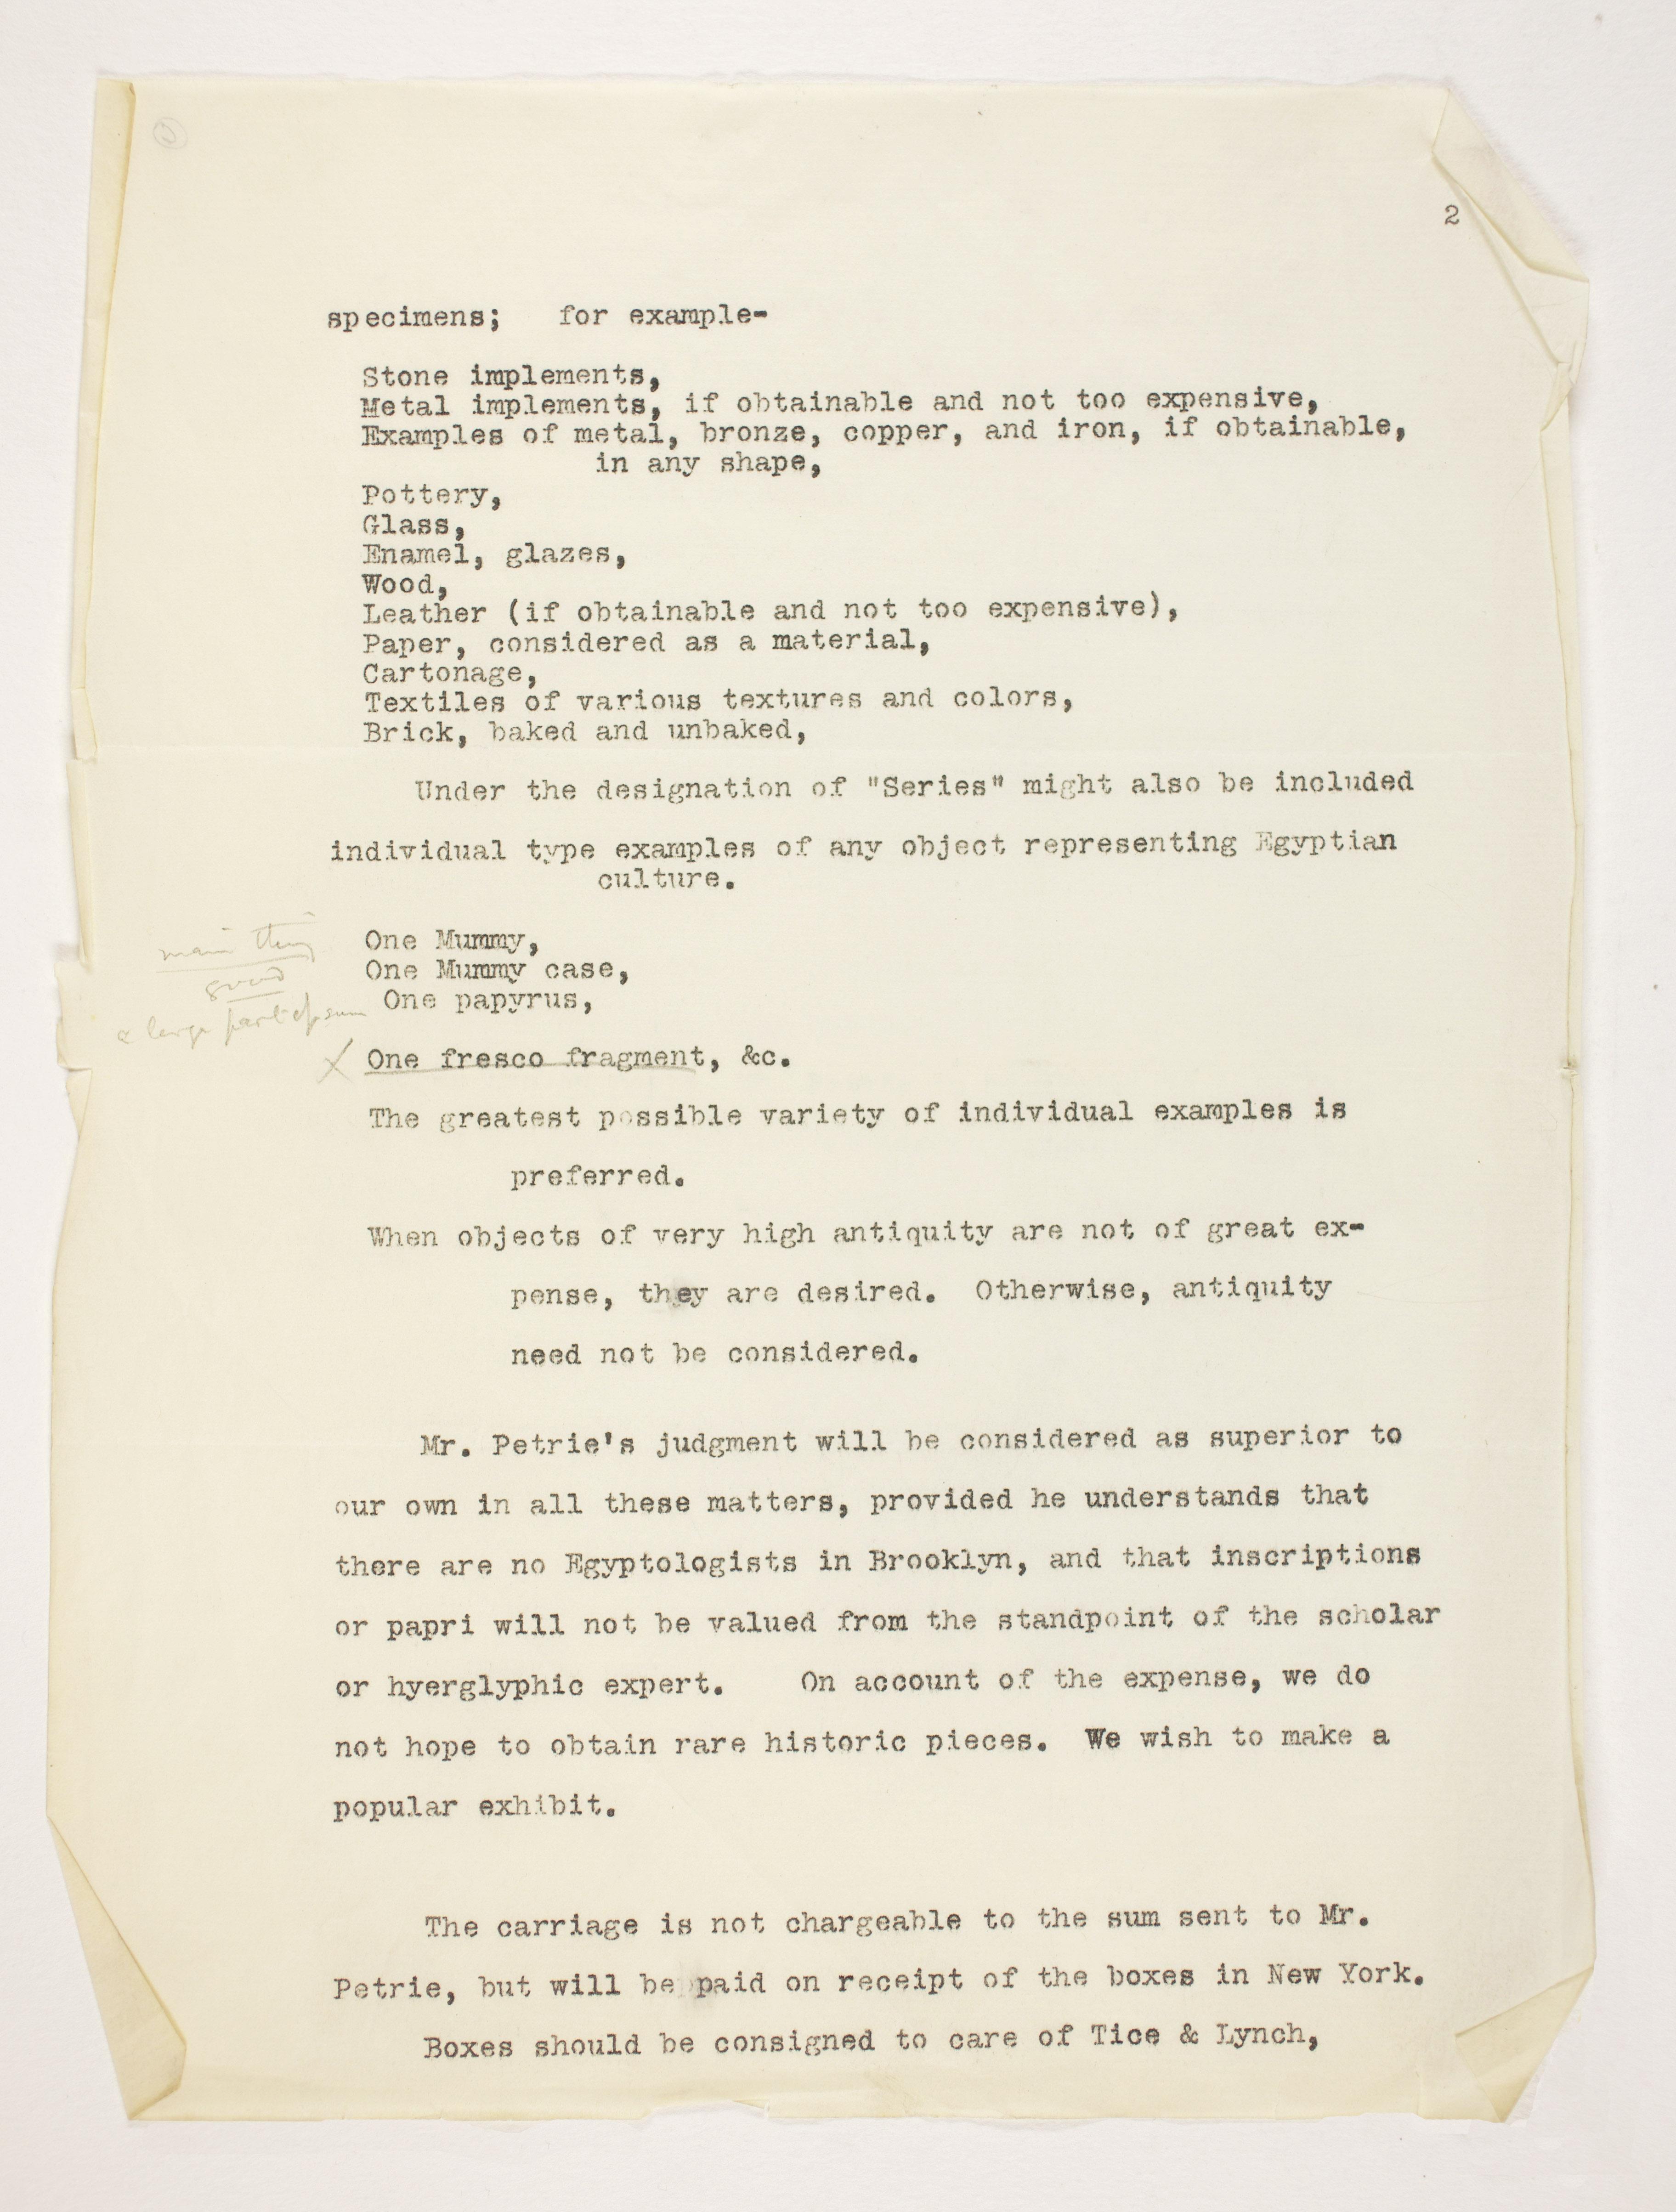 1904-05 Saqqara, Serabit el-Khadim, Sinai, Magharah, Sinai Correspondence PMA/WFP1/D/13/6